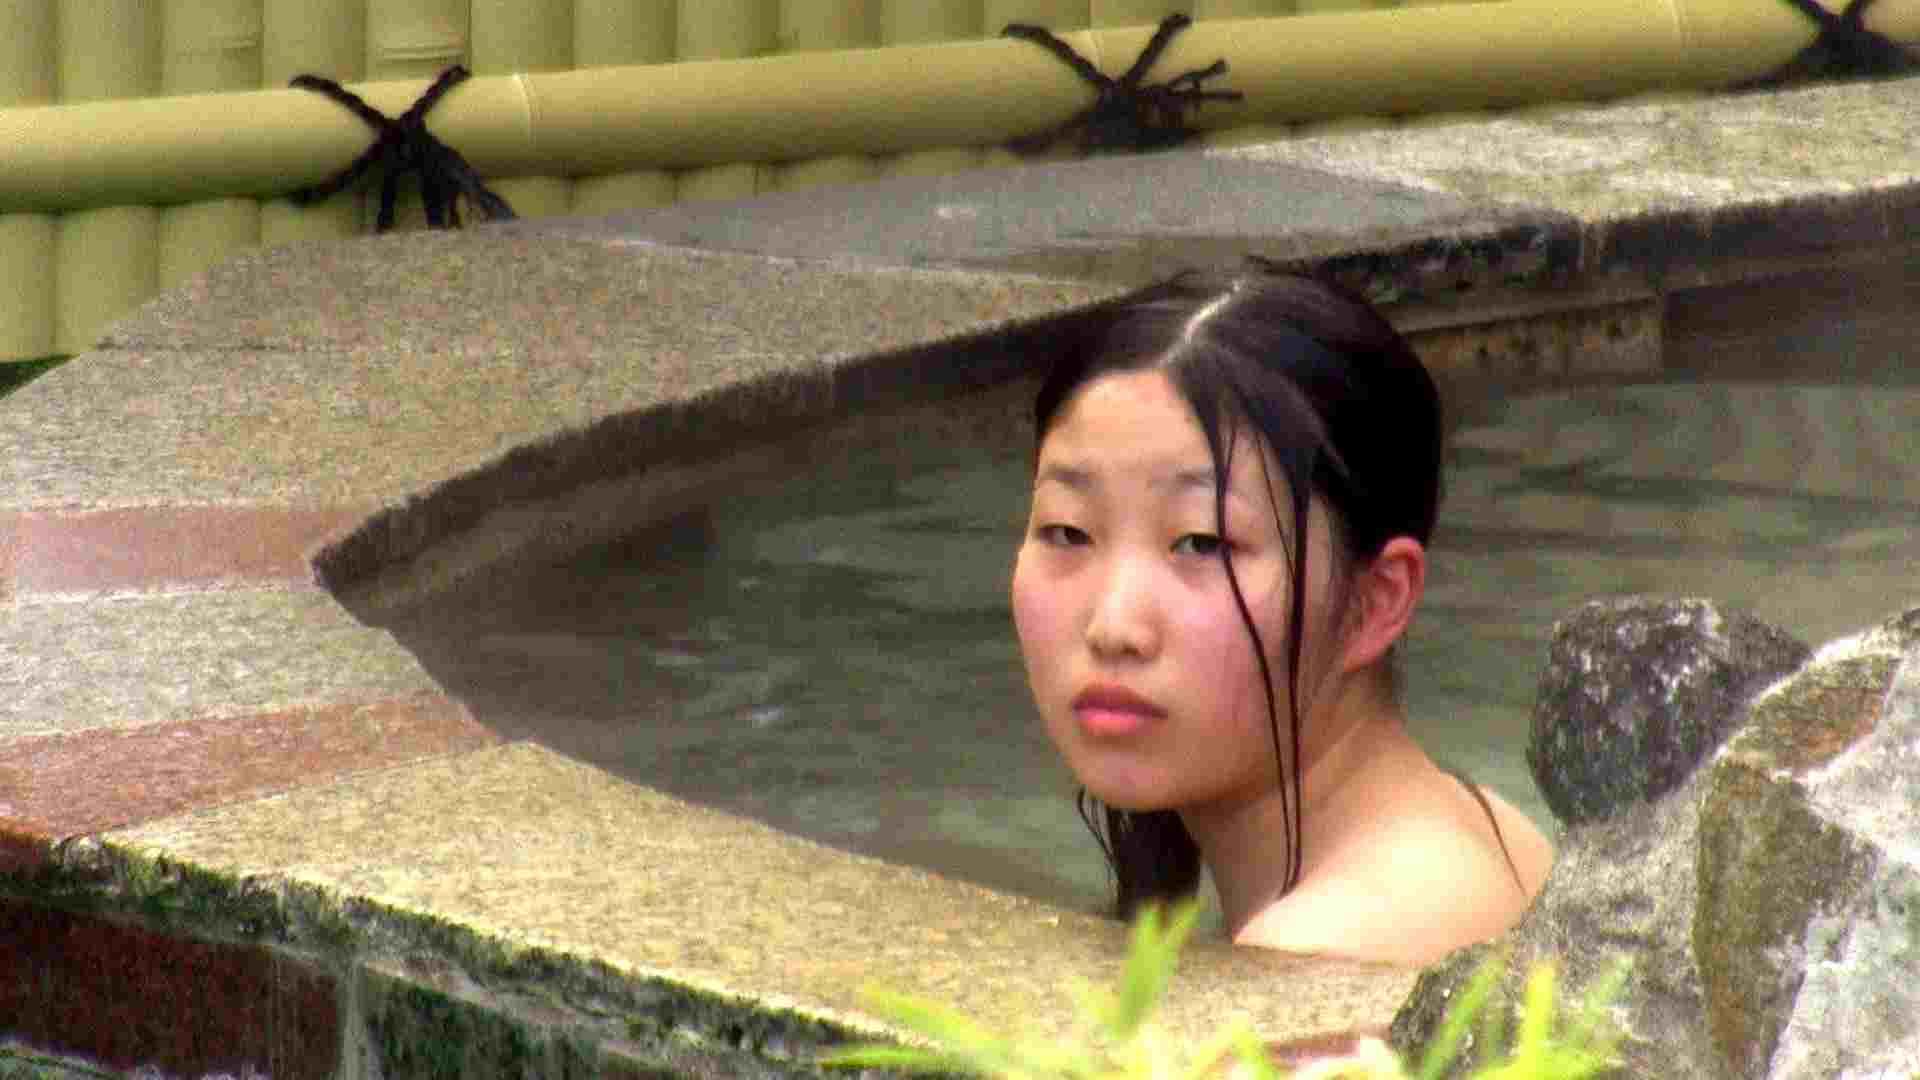 Aquaな露天風呂Vol.218 OLエロ画像 盗撮オマンコ無修正動画無料 81PICs 47